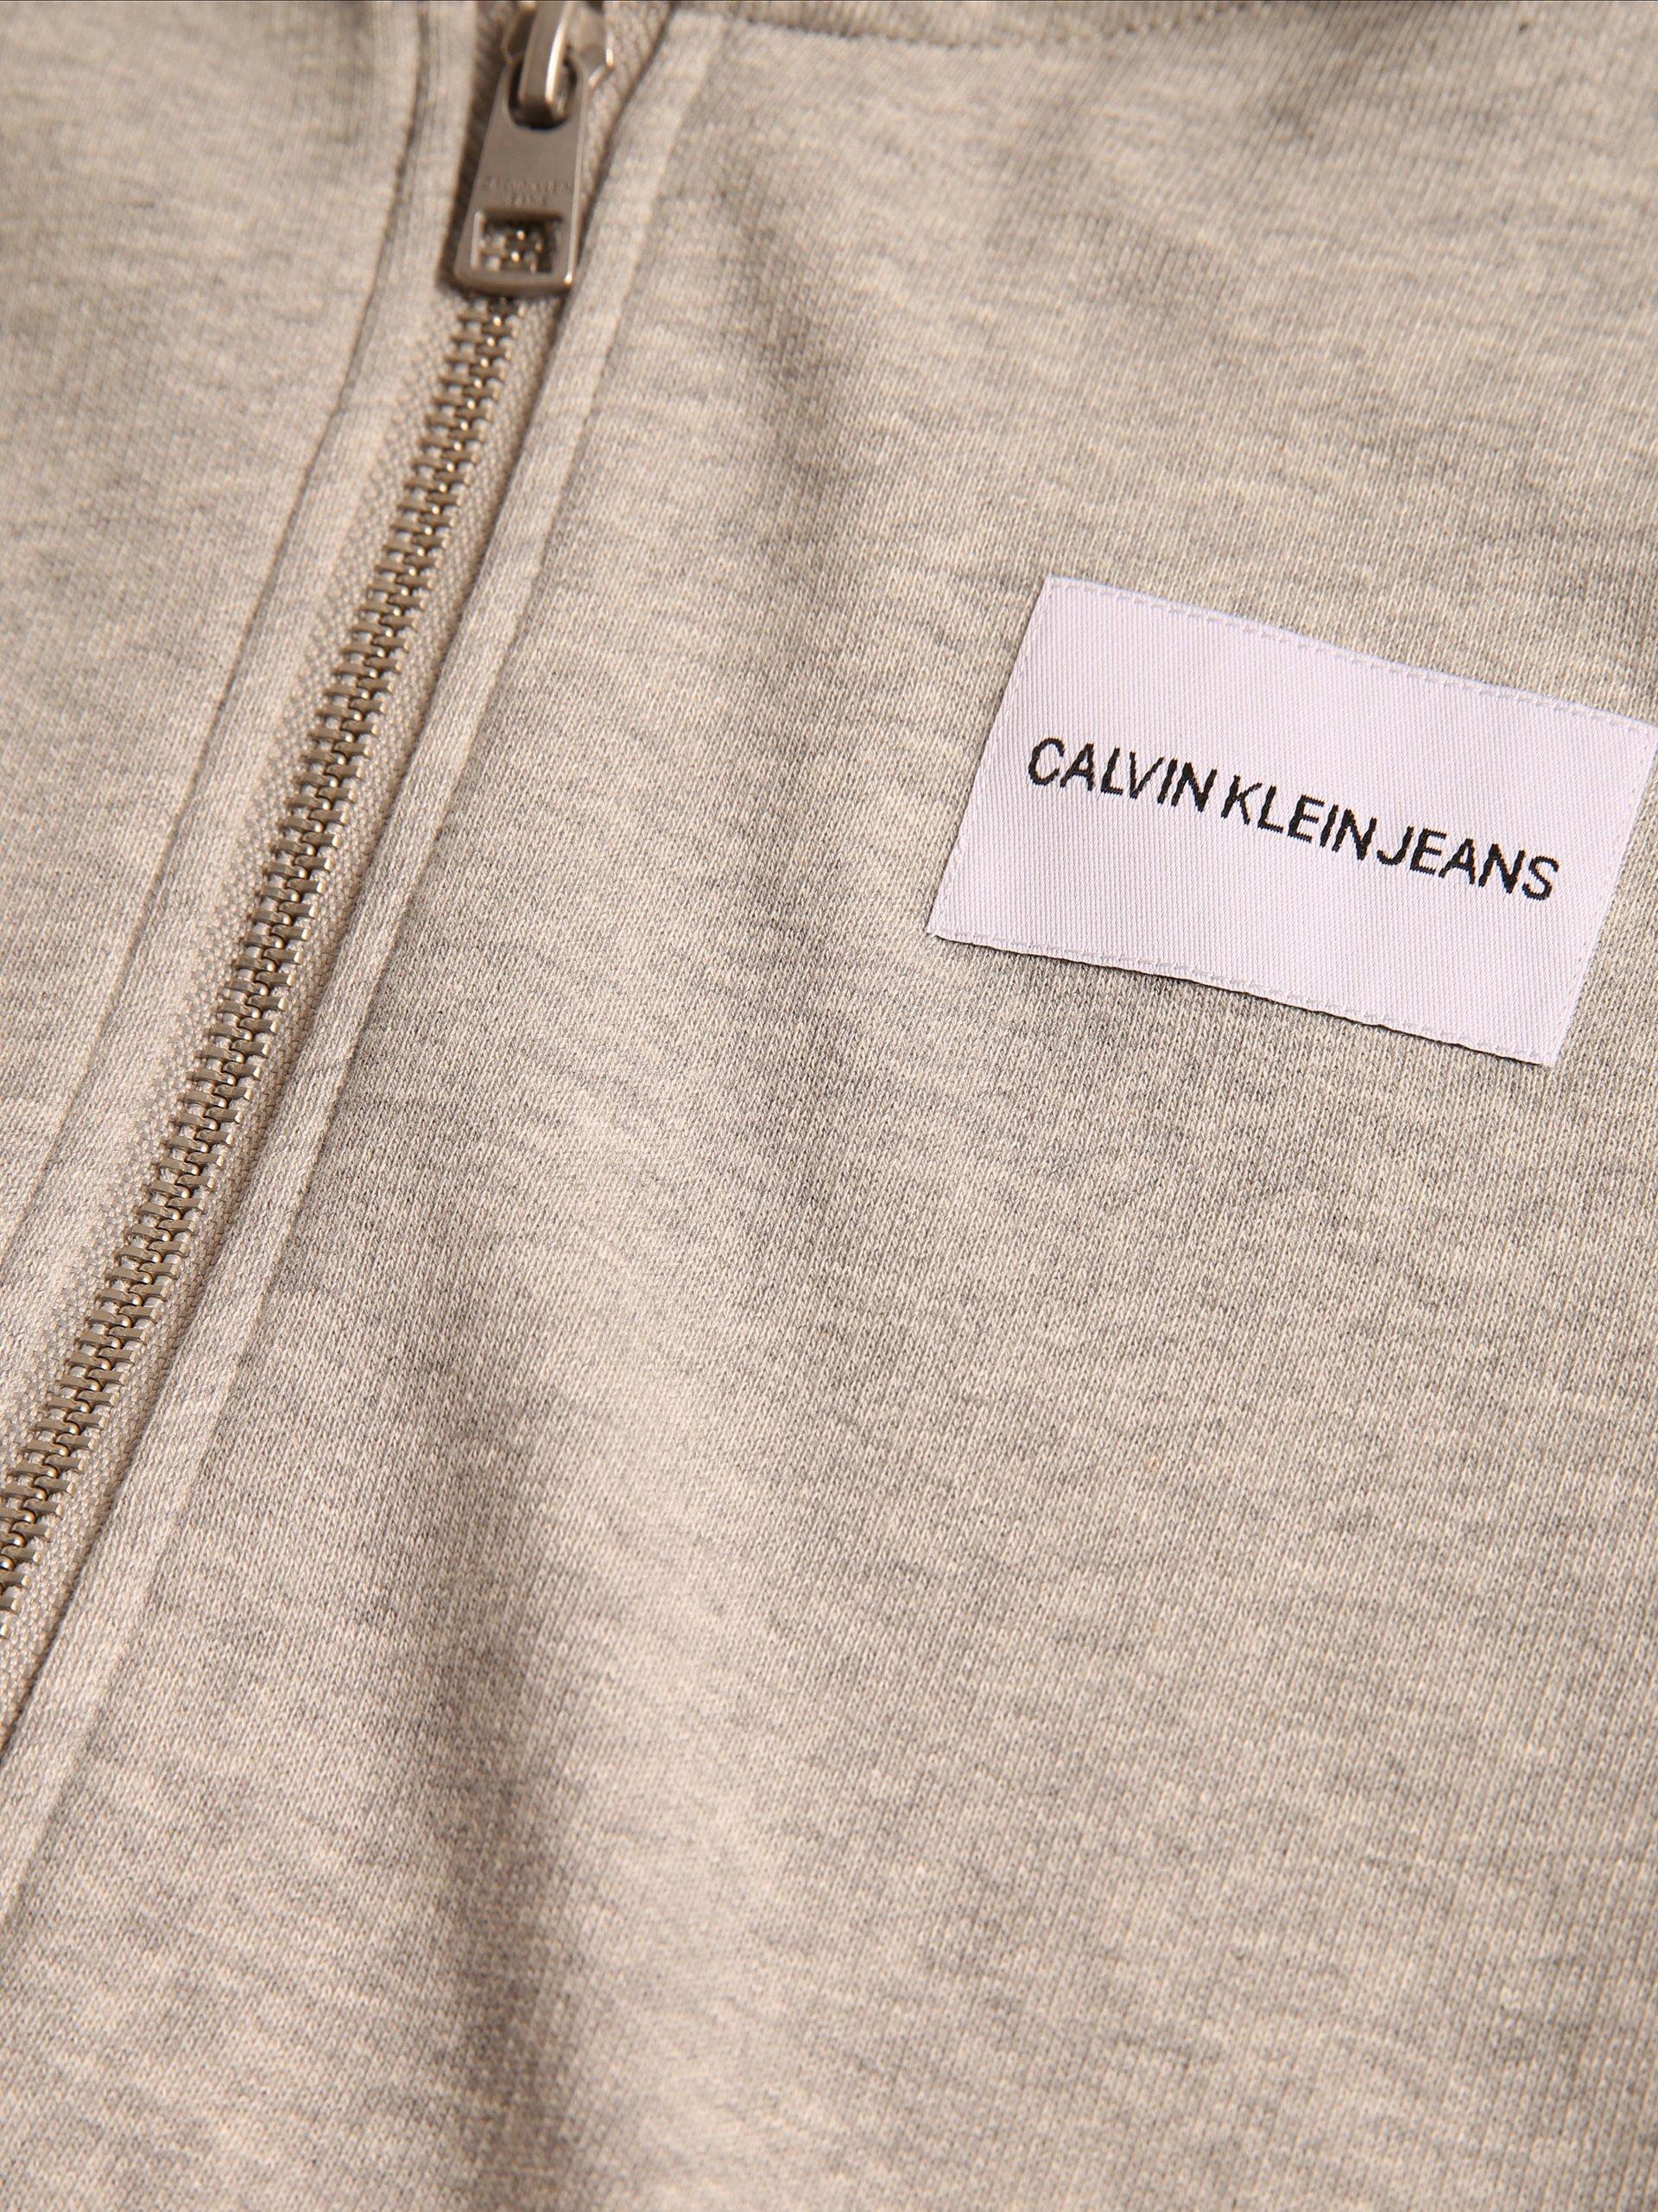 Jungen com Online Klein Vangraaf Kaufen Calvin Jeans Sweatjacke qwFxfxpS